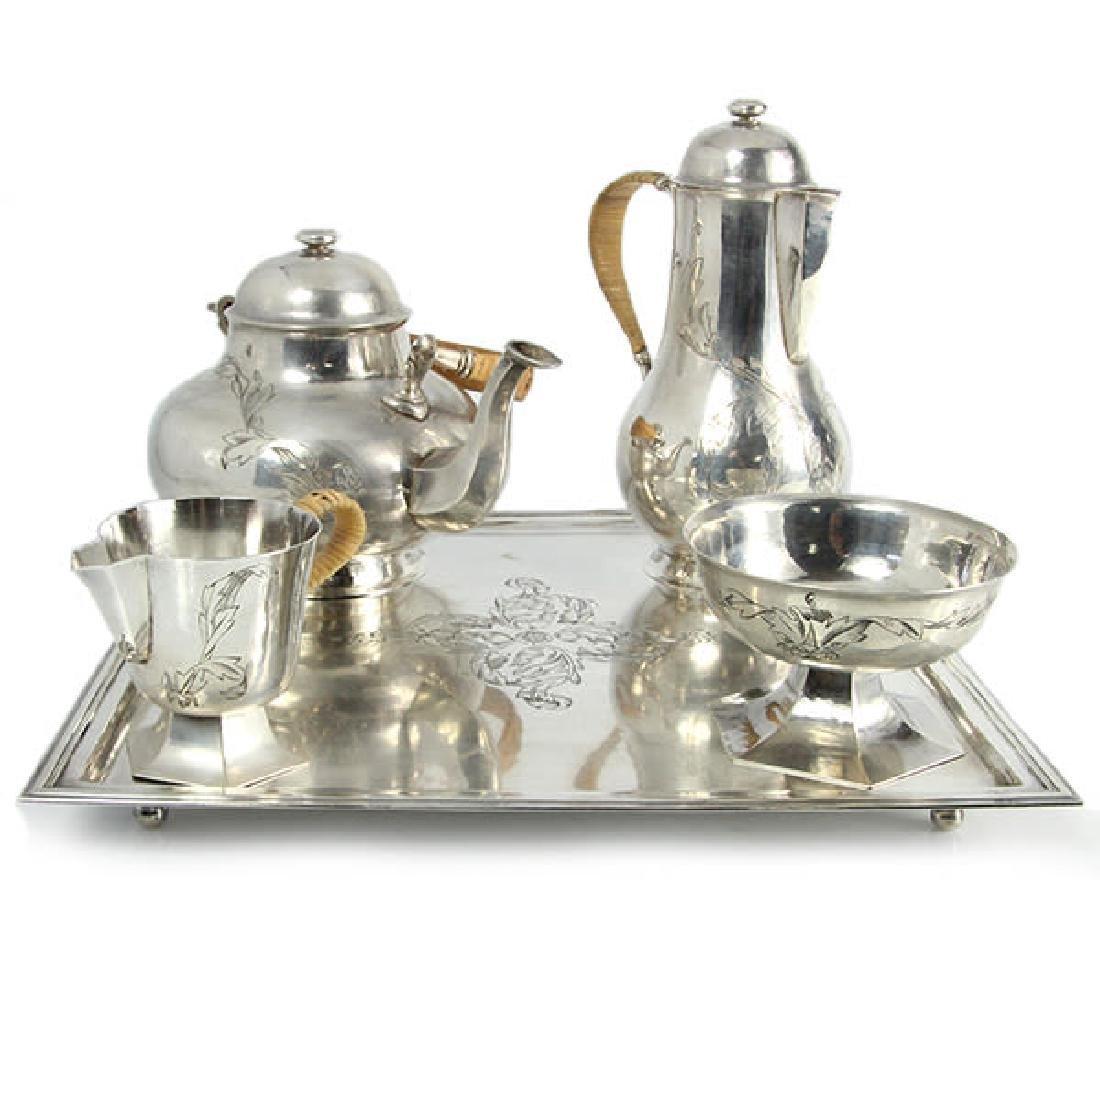 Silver 5pcs Tea & Coffee Set, Circa 1920.